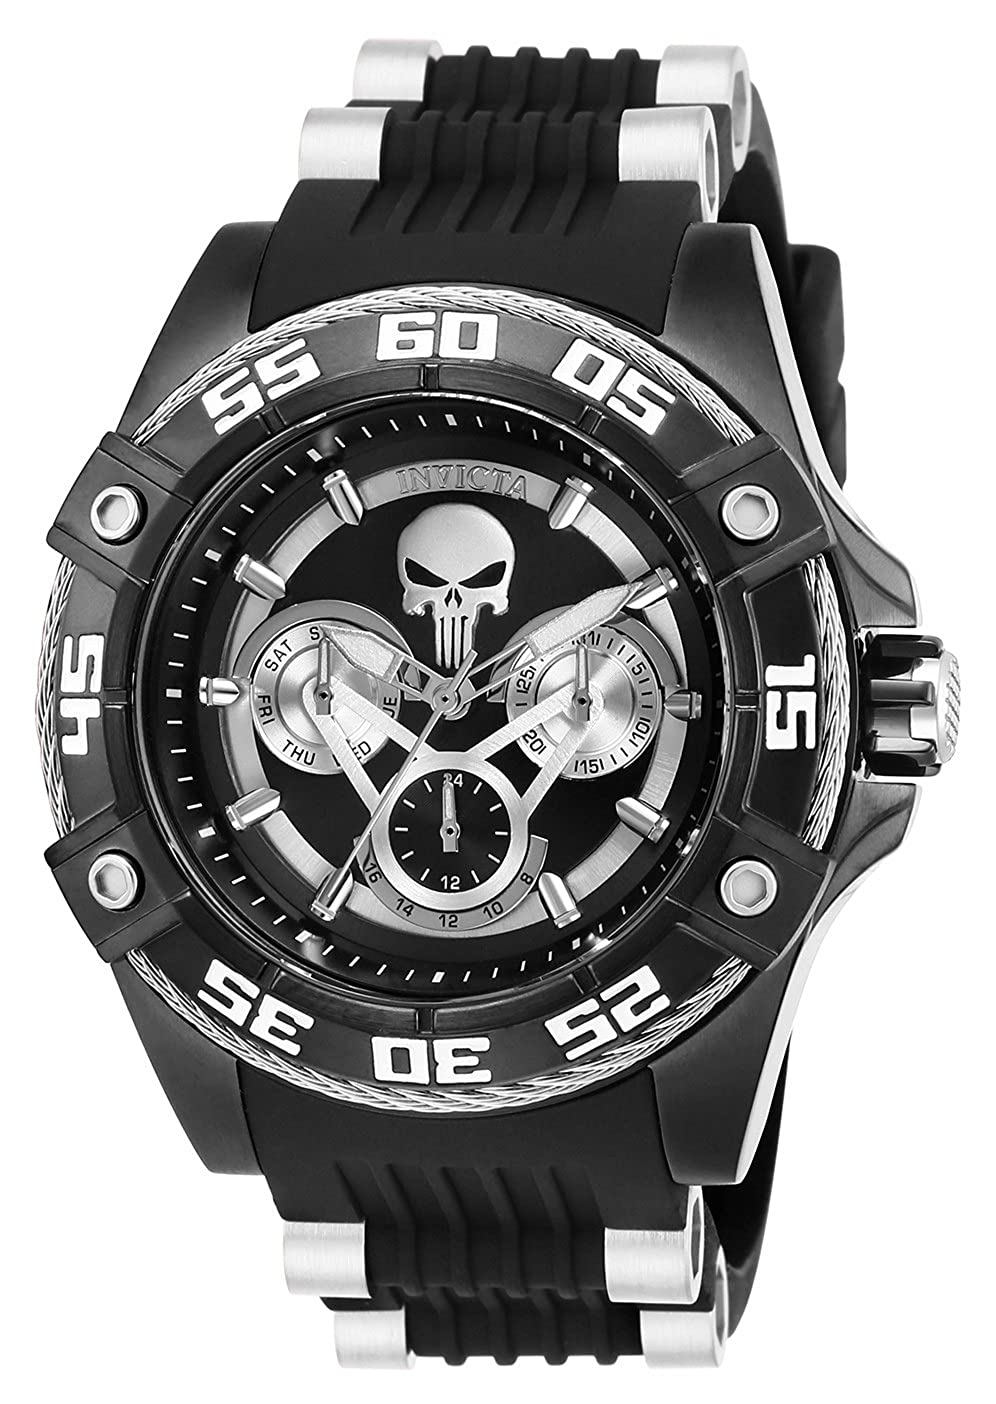 Invicta 27033 Marvel - Punisher Reloj Unisex acero inoxidable Cuarzo Esfera negro